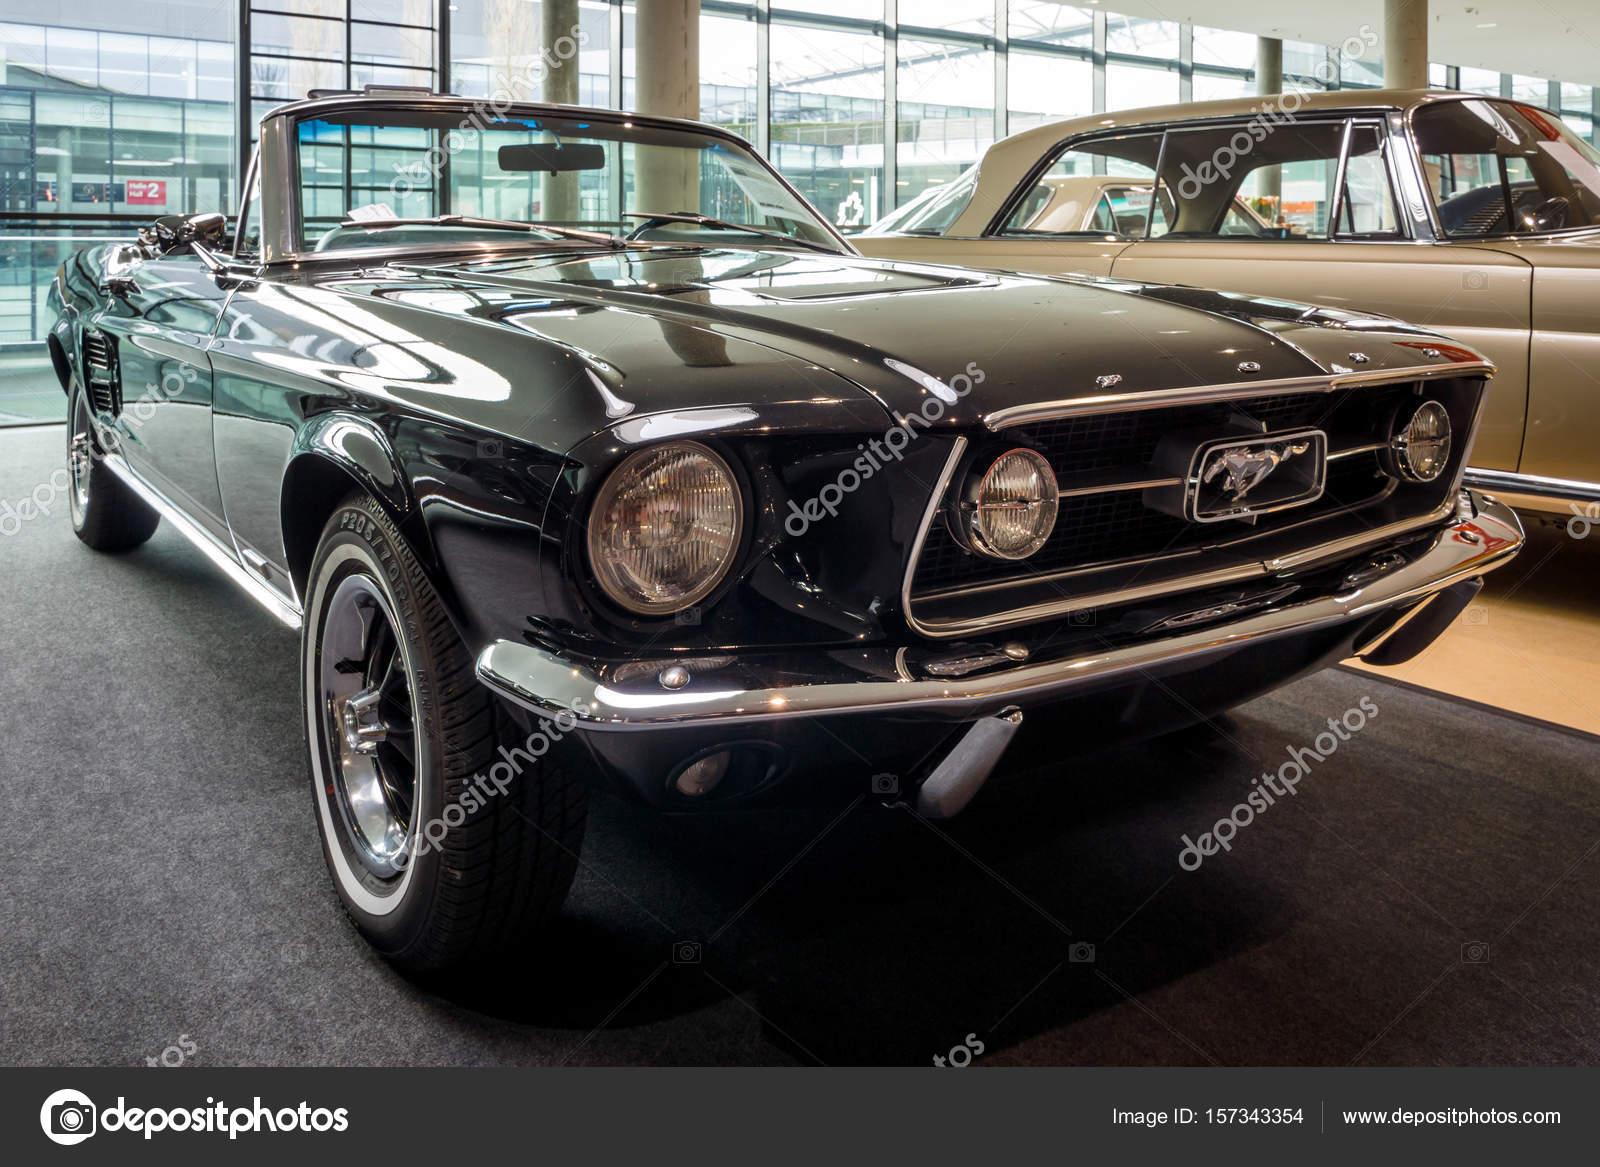 pony auto ford mustang v8 cabrio gt 1967 redactionele. Black Bedroom Furniture Sets. Home Design Ideas